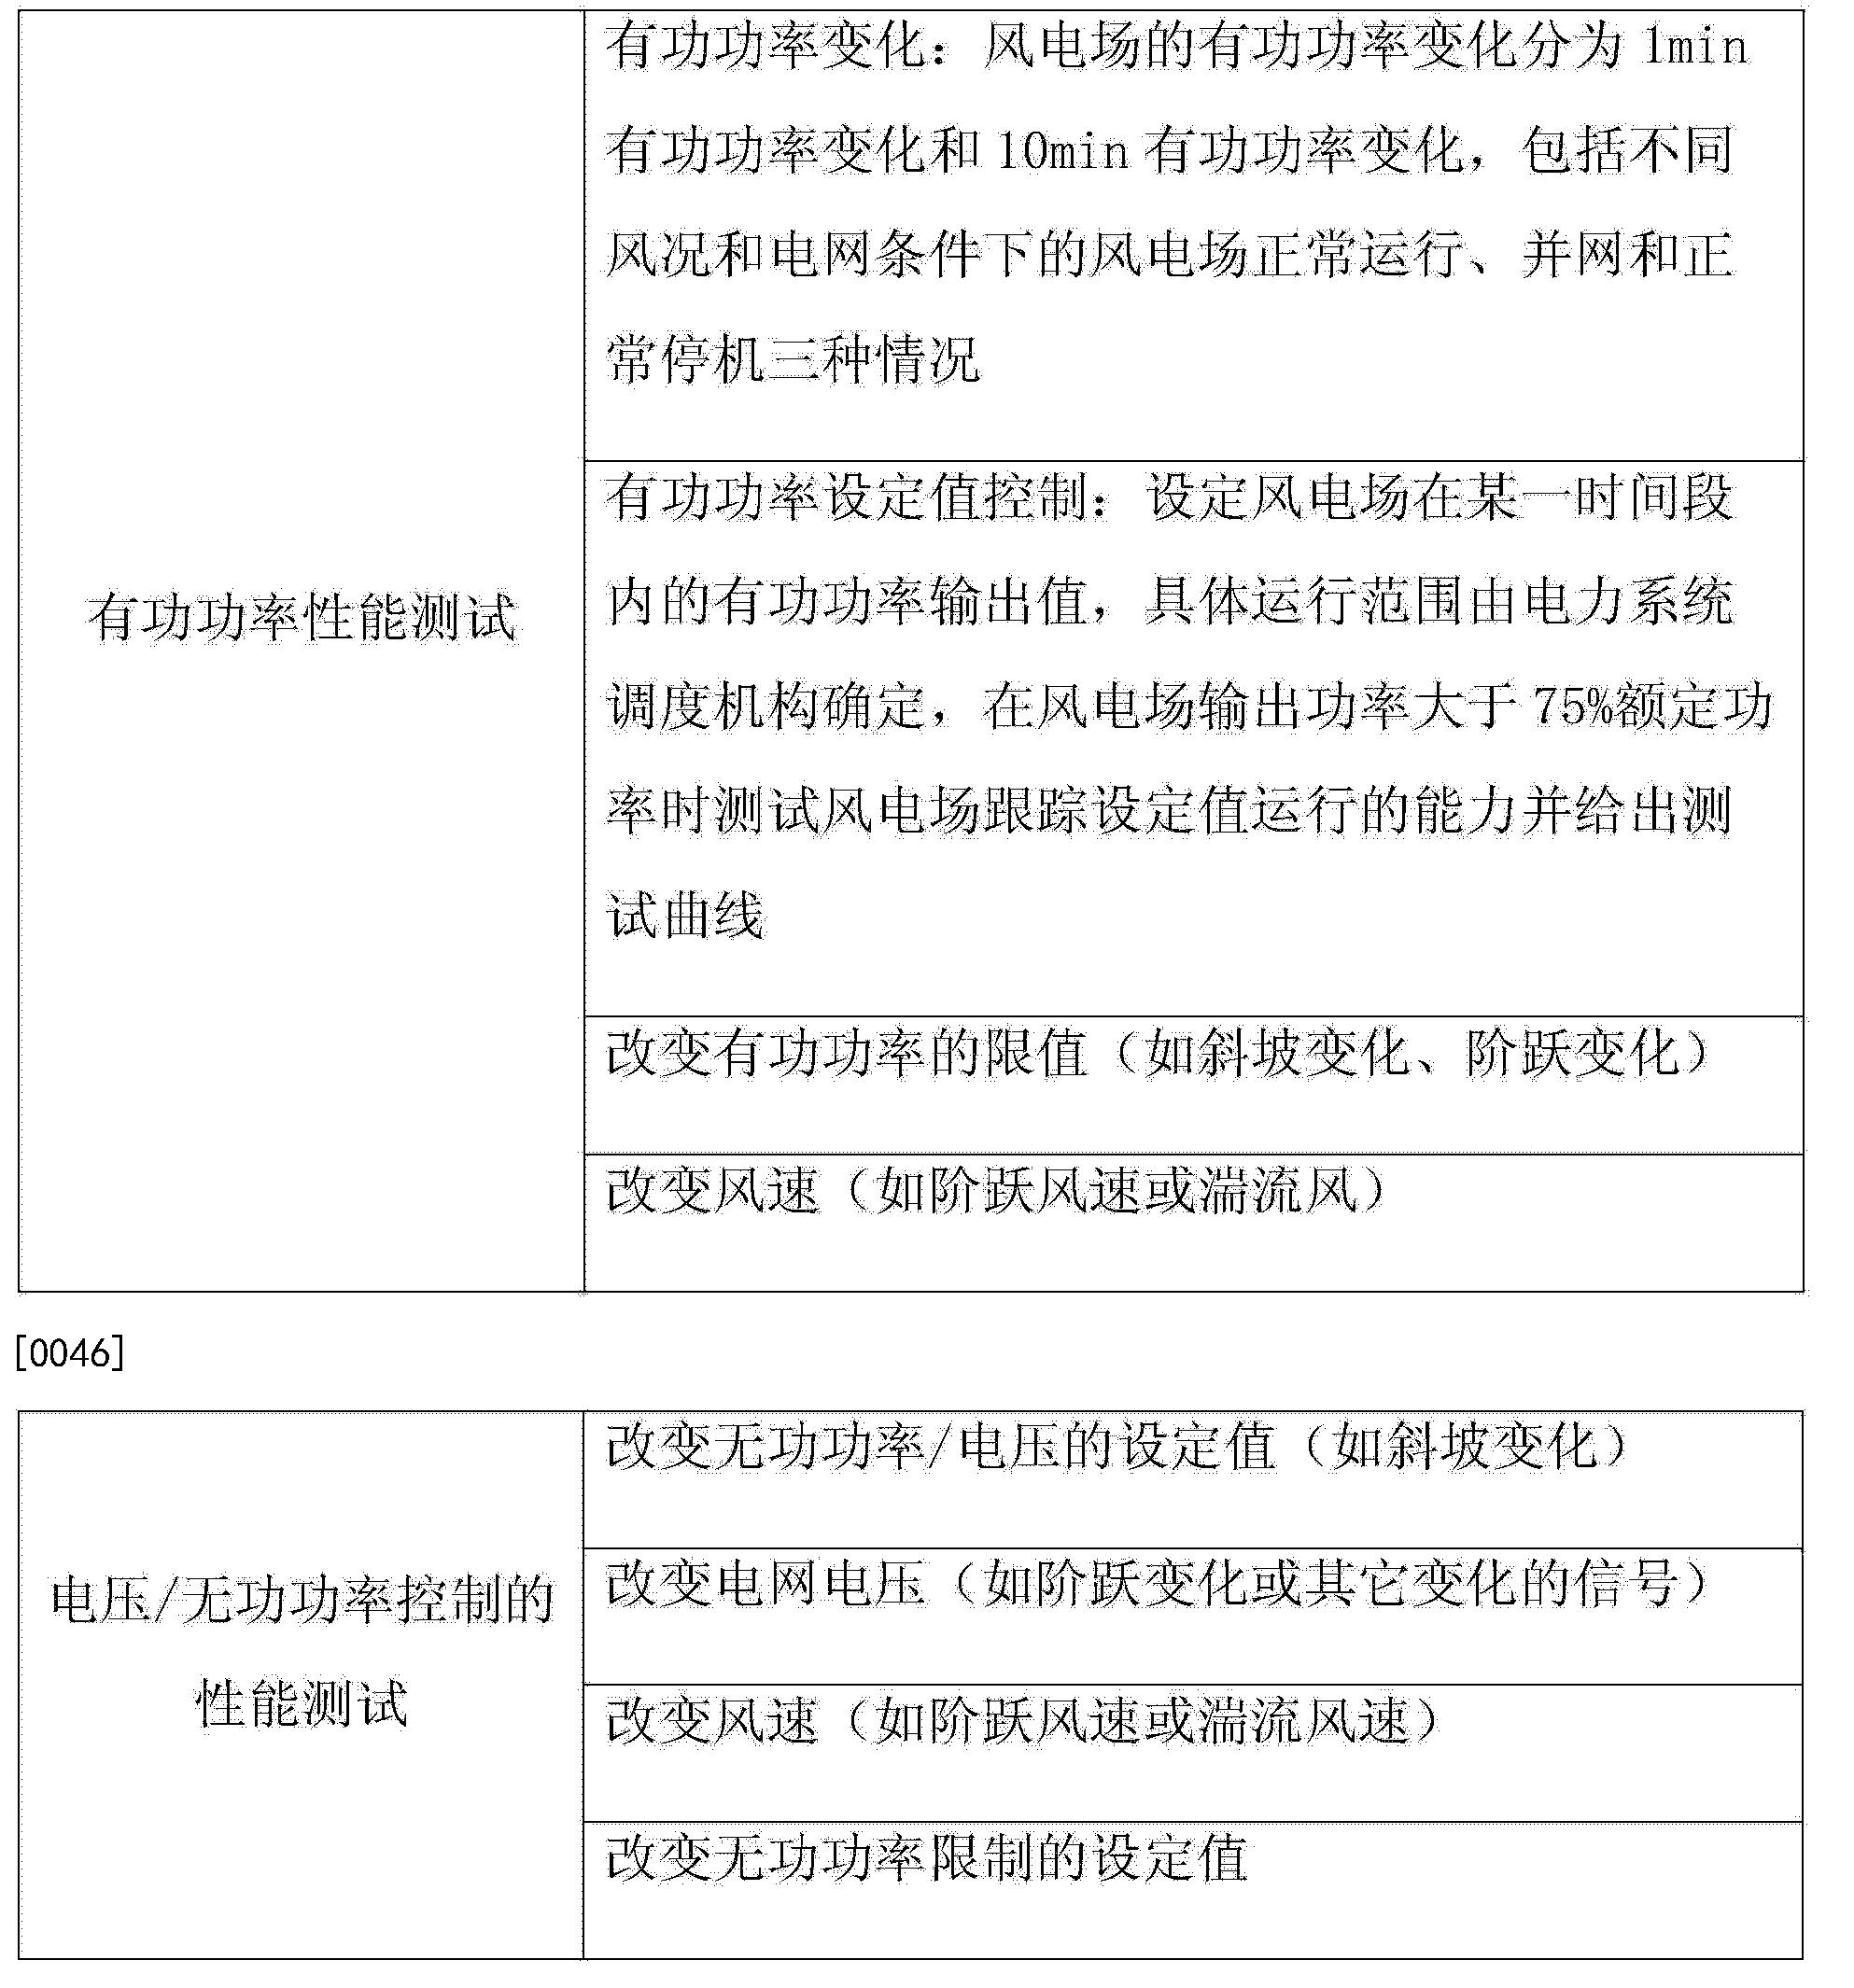 Figure CN204314716UD00061